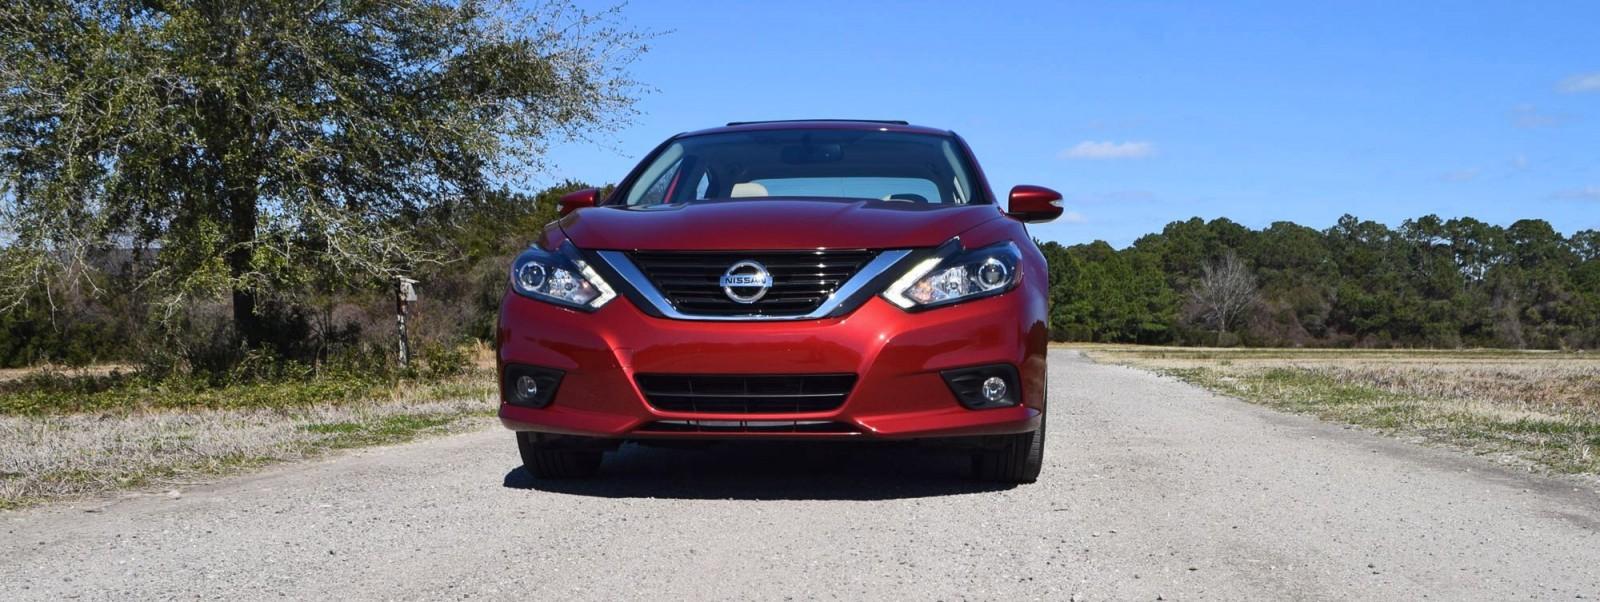 Elegant Road Test Review  2016 Nissan Altima SL  Fresh Face For